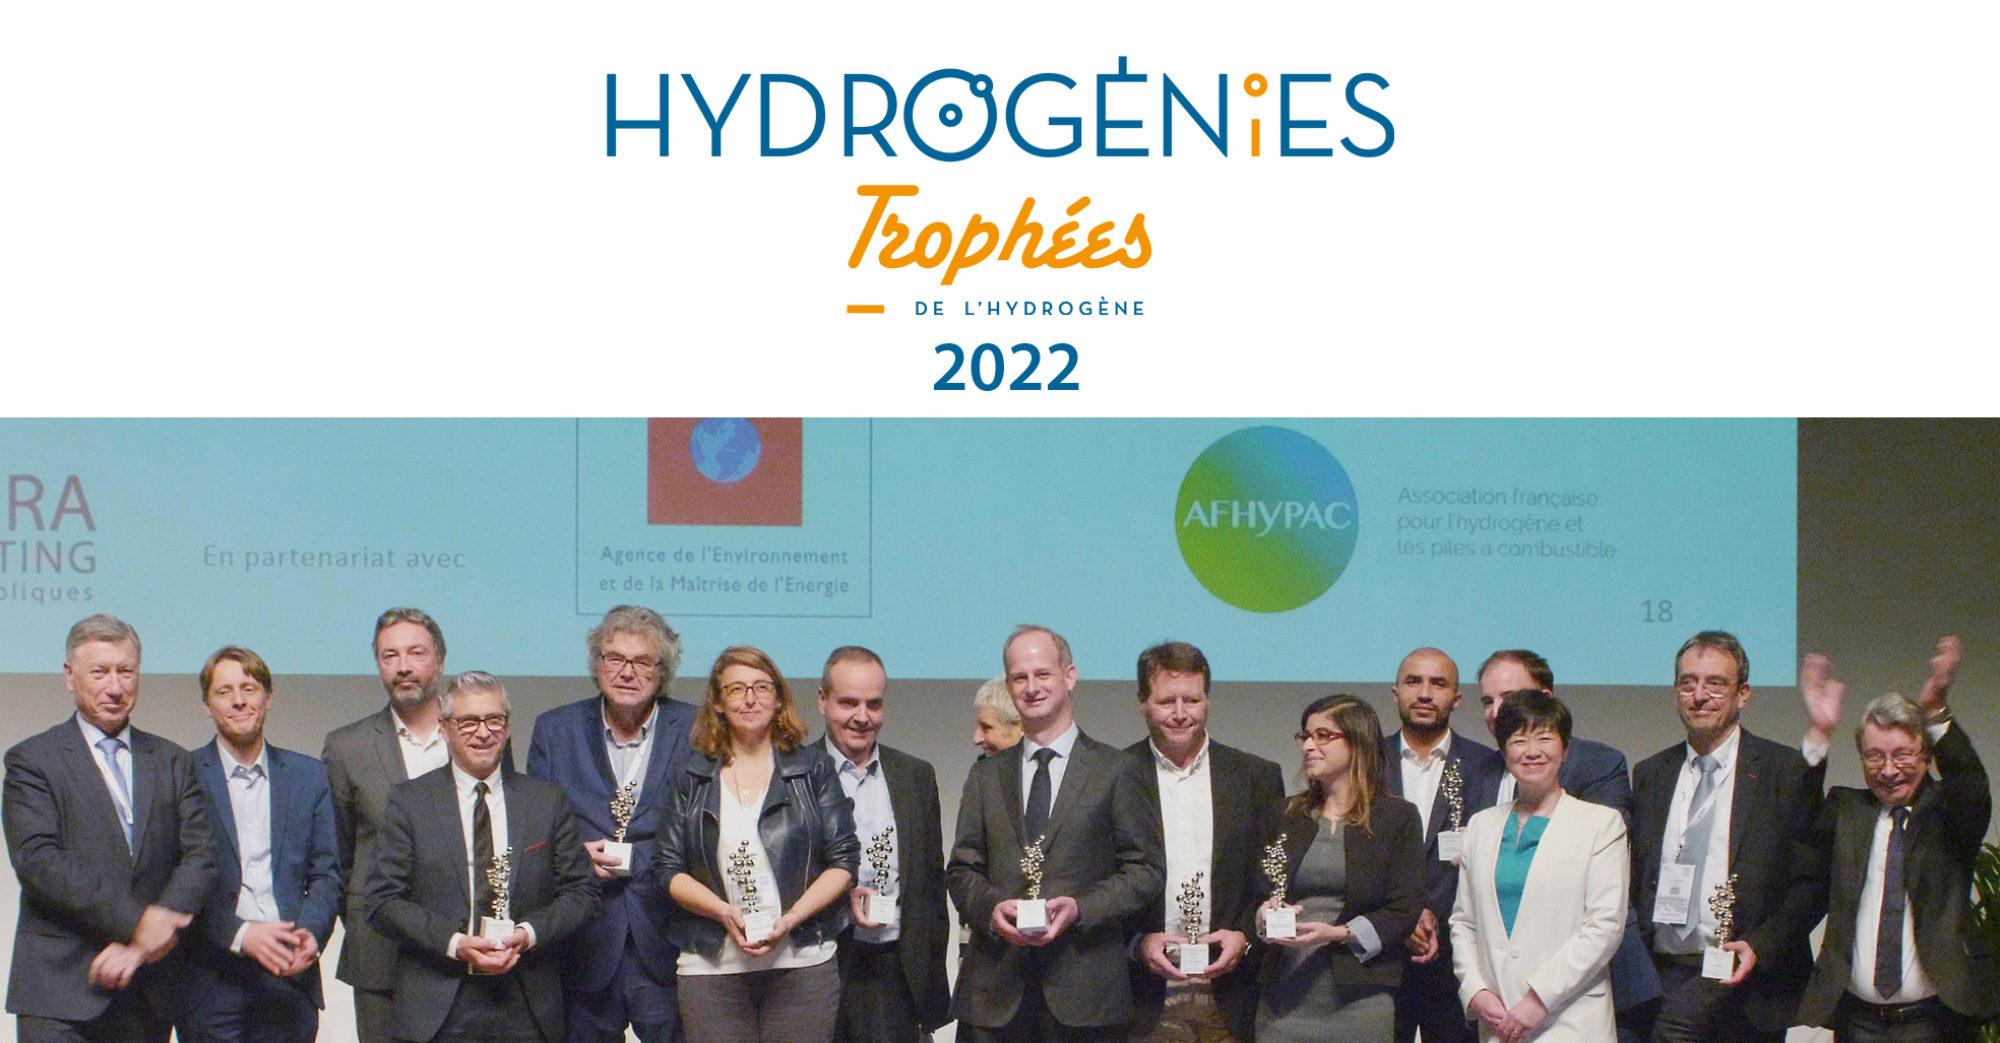 Hydrogénies